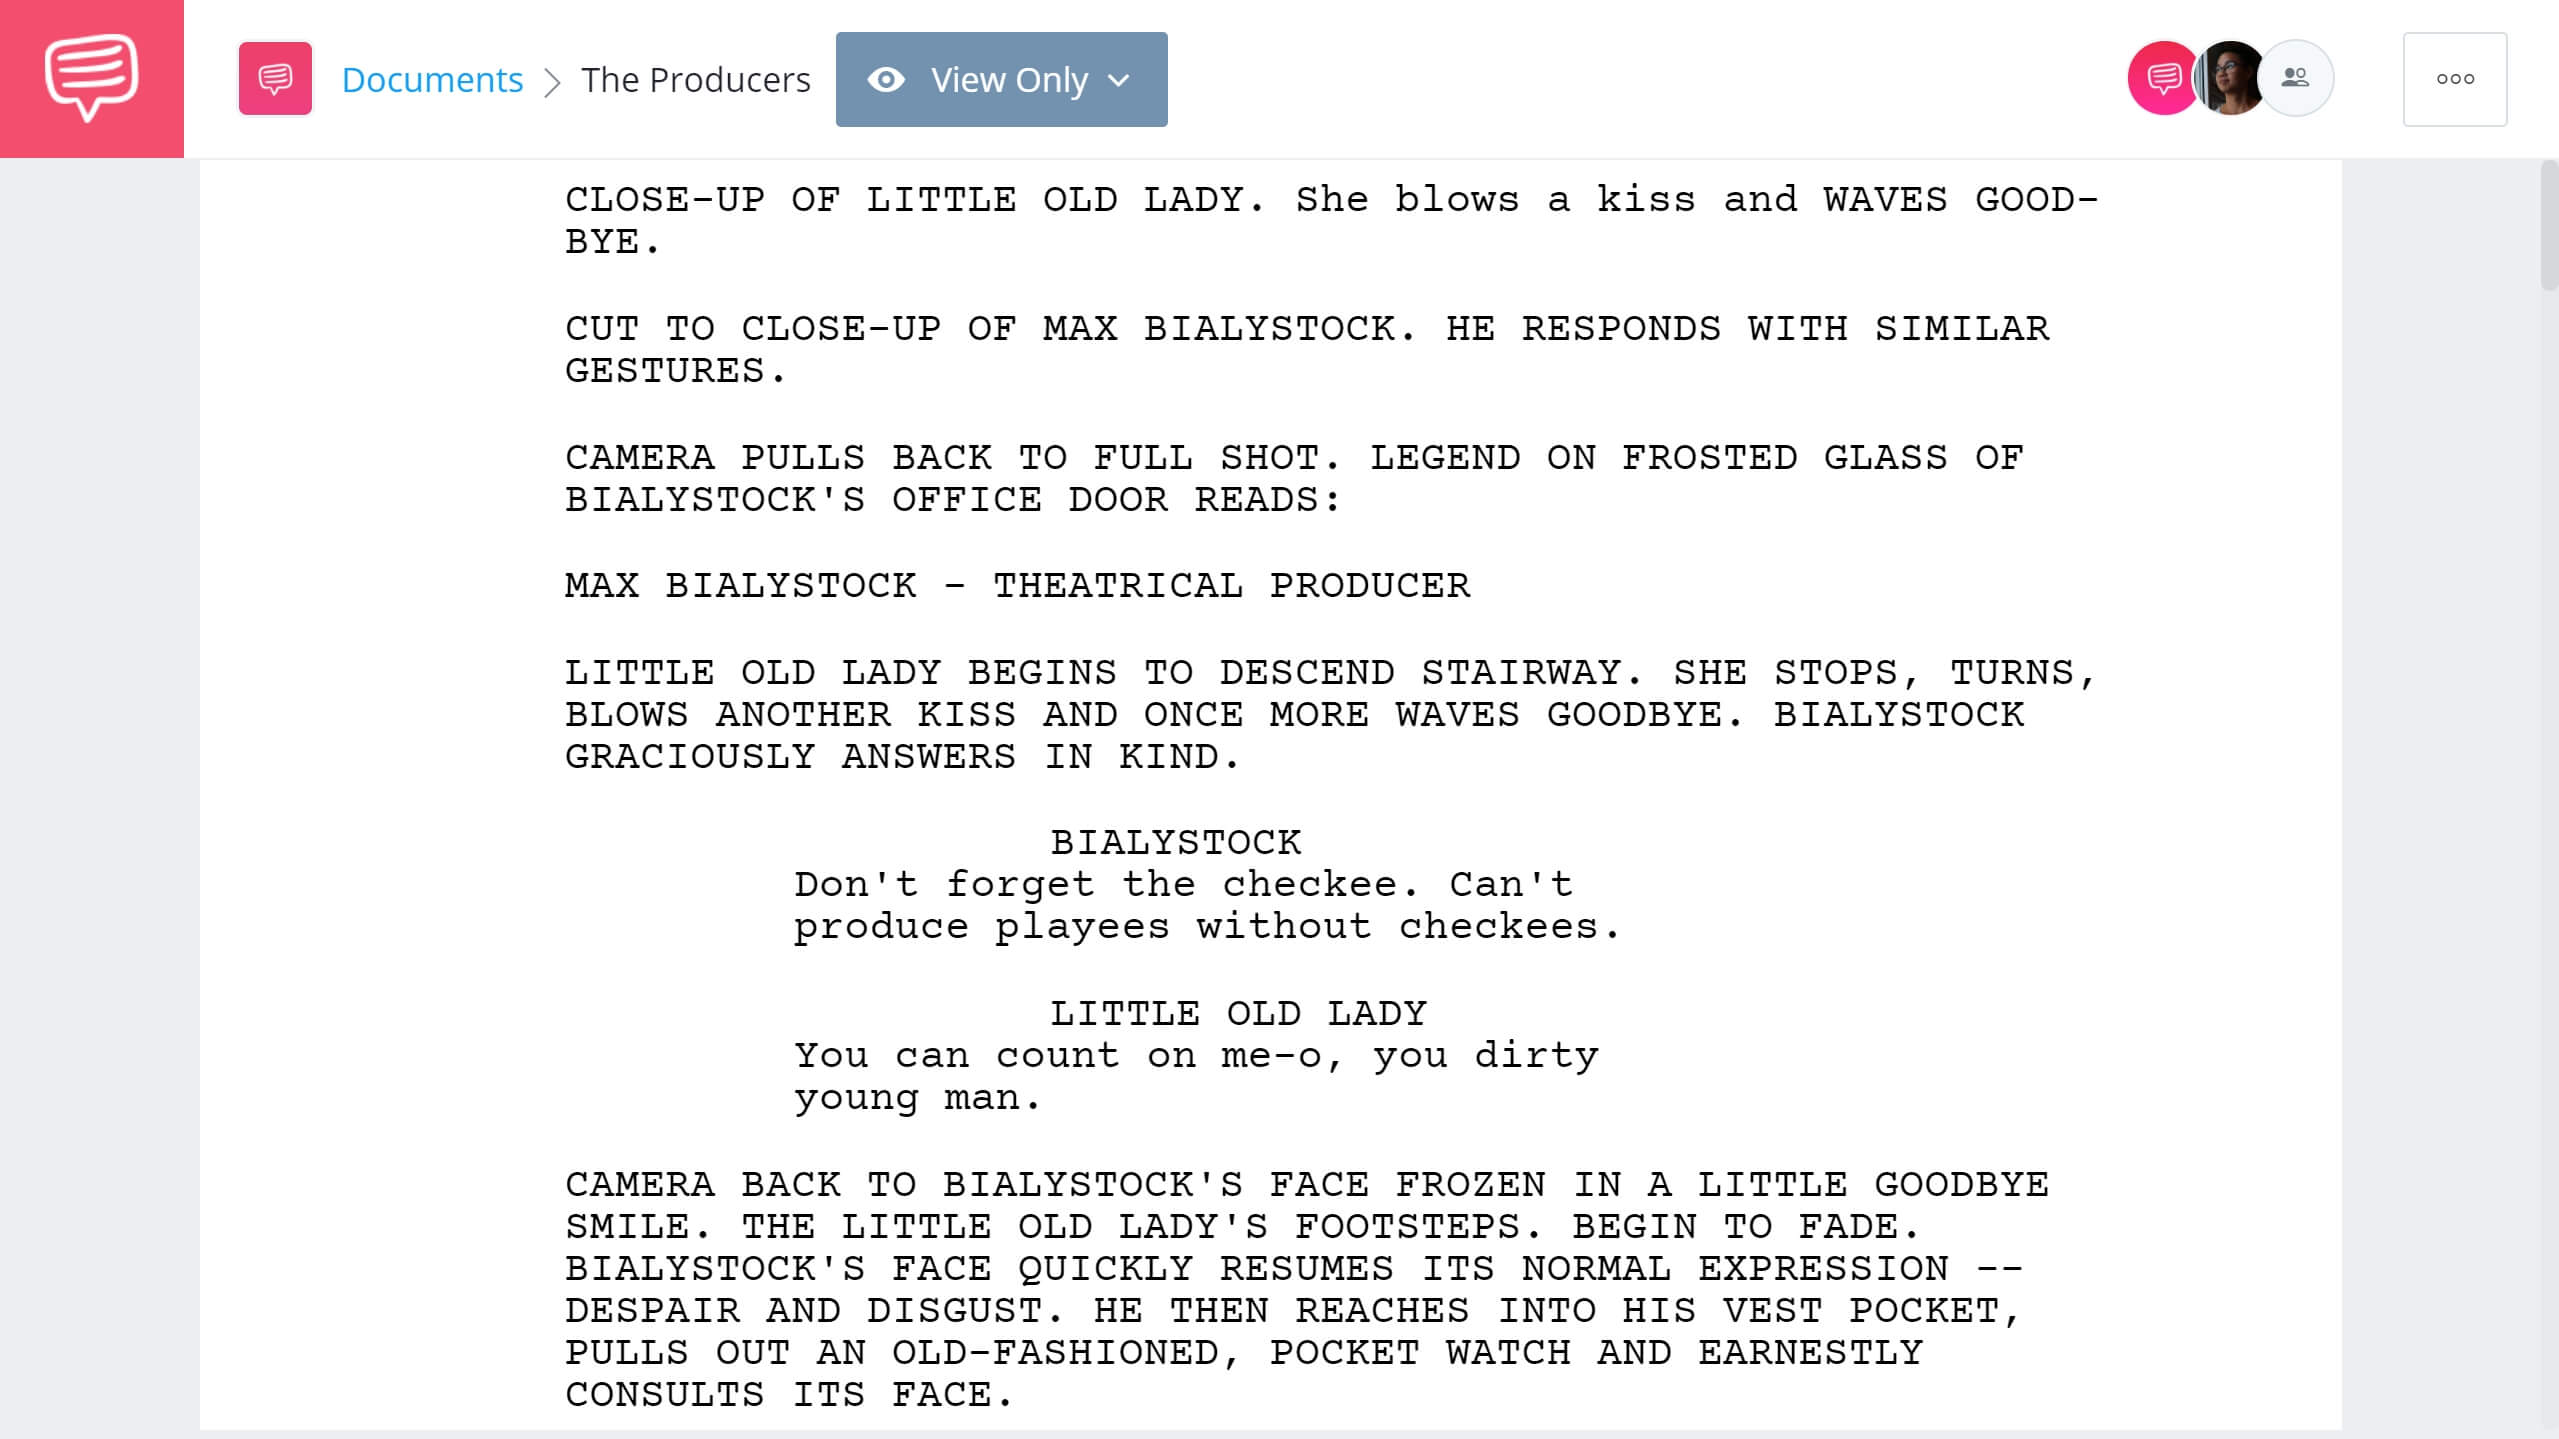 Best Original Screenplay Academy Award - The Producers Full Script PDF Download - StudioBinder Screenwriting Software